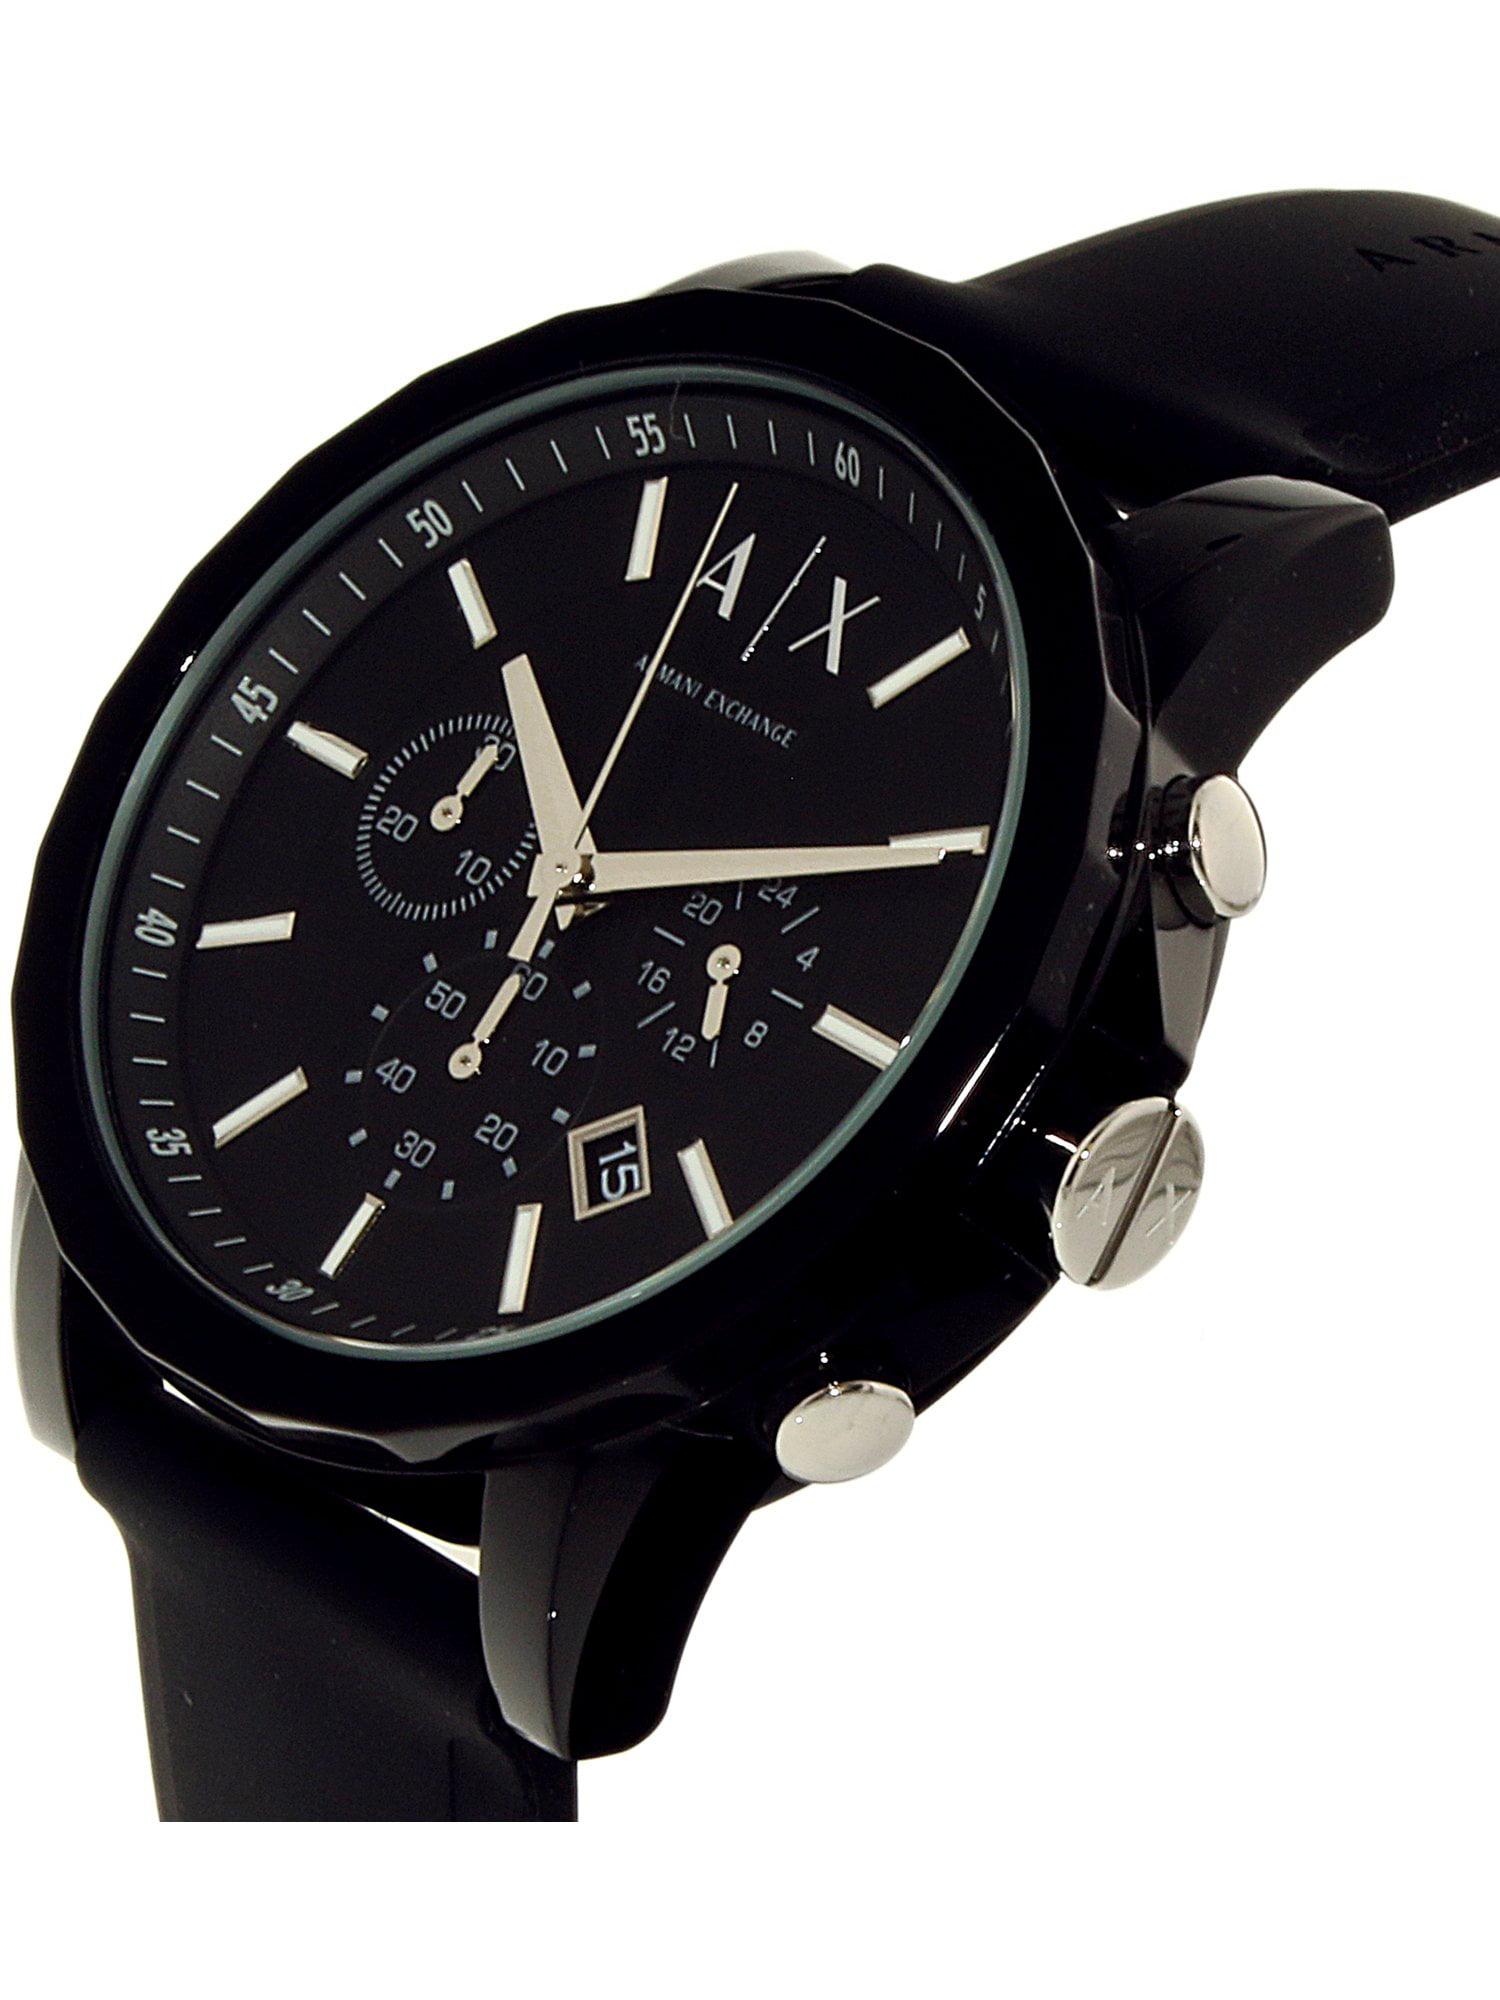 fa8e5a10d18a Armani Exchange - Active Chronograph Mens Watch AX1326 - Walmart.com